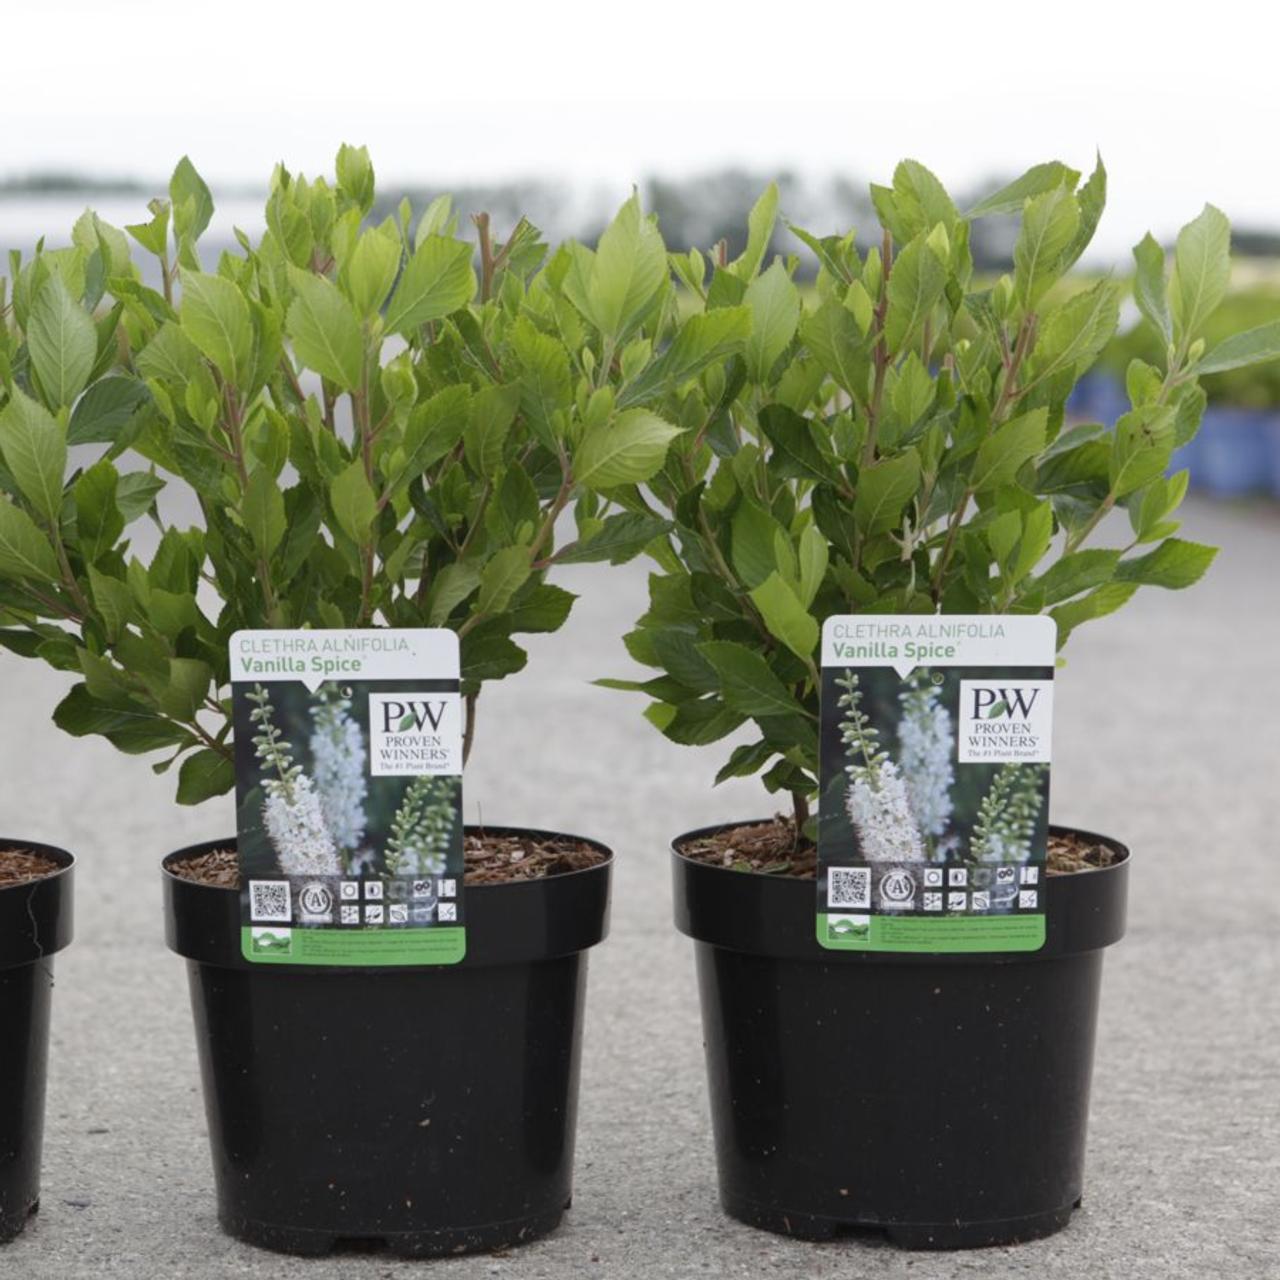 Clethra alnifolia 'Vanilla Spice' plant